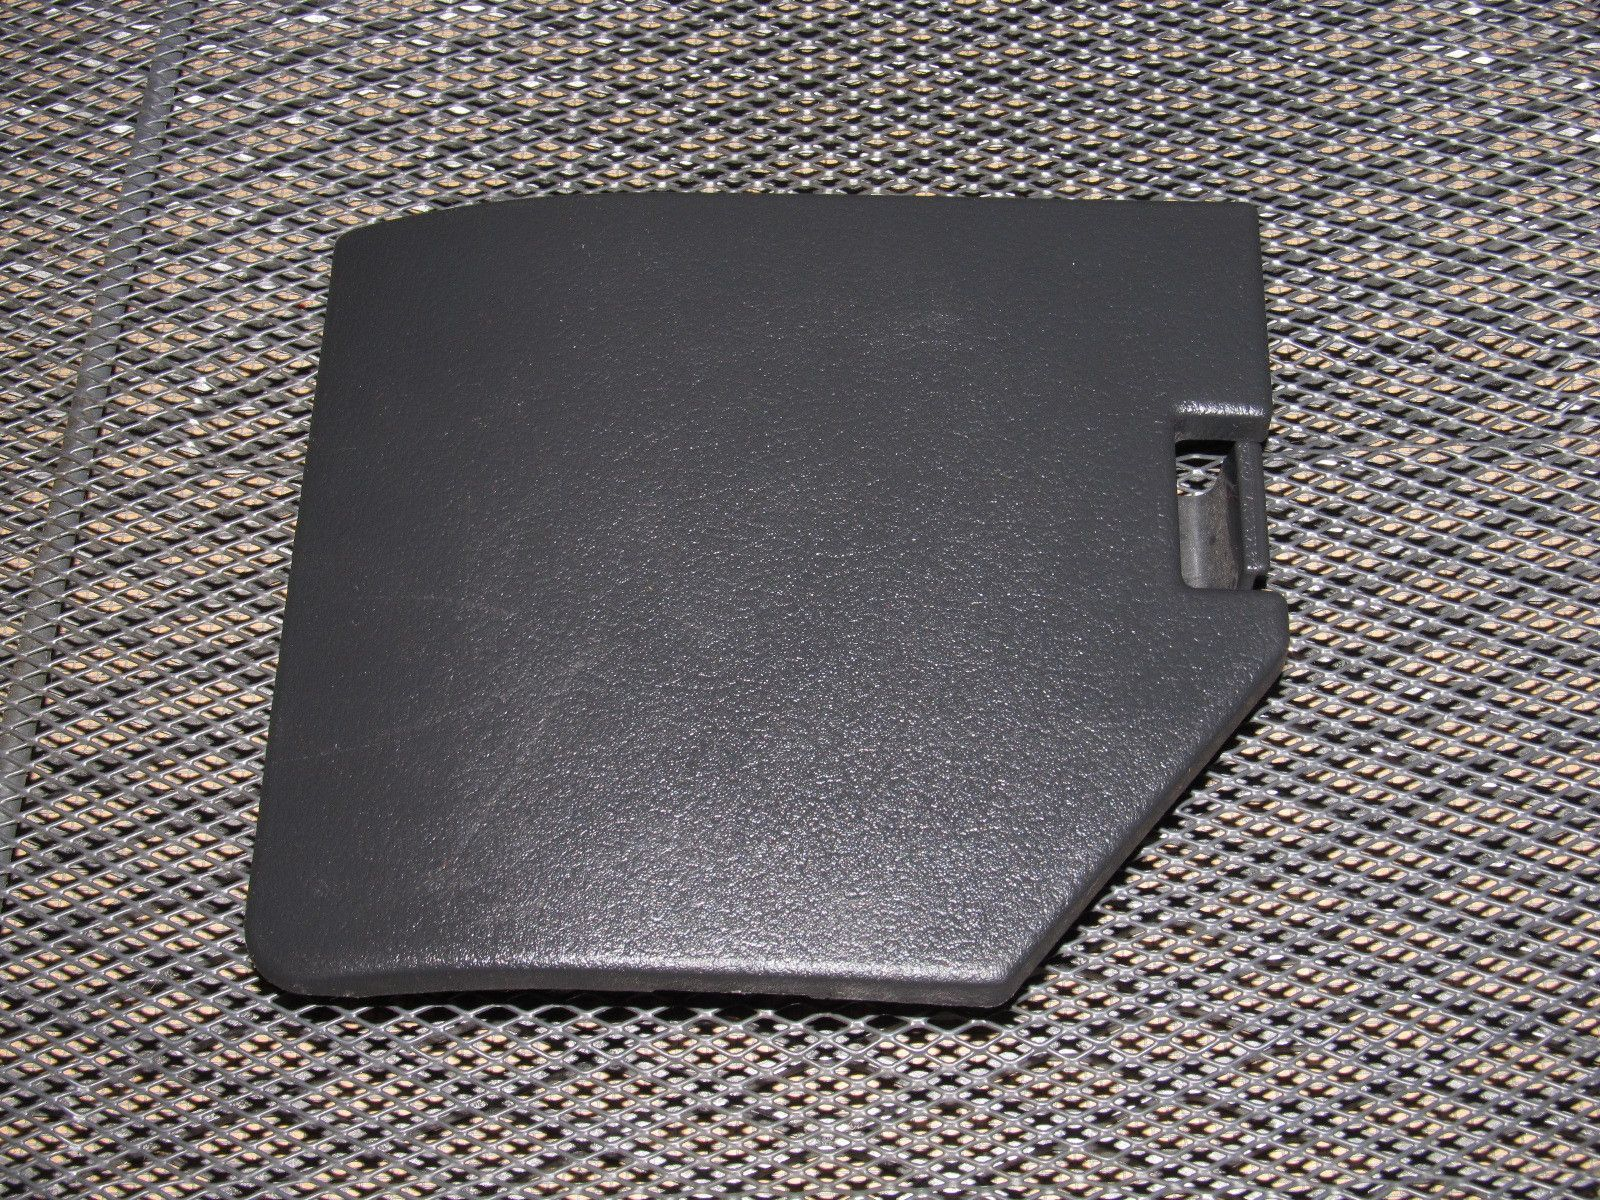 91 92 93 94 nissan 240sx oem interior fuse box cover [ 1600 x 1200 Pixel ]